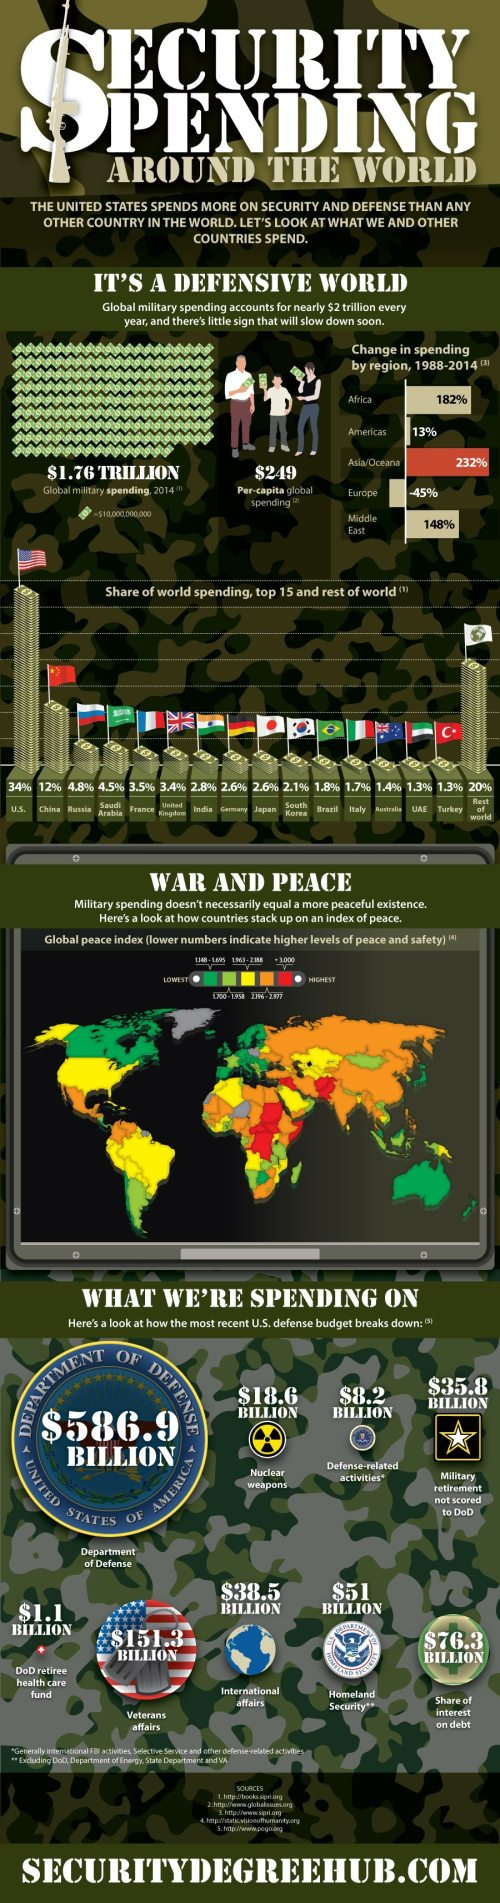 Global Security Spending